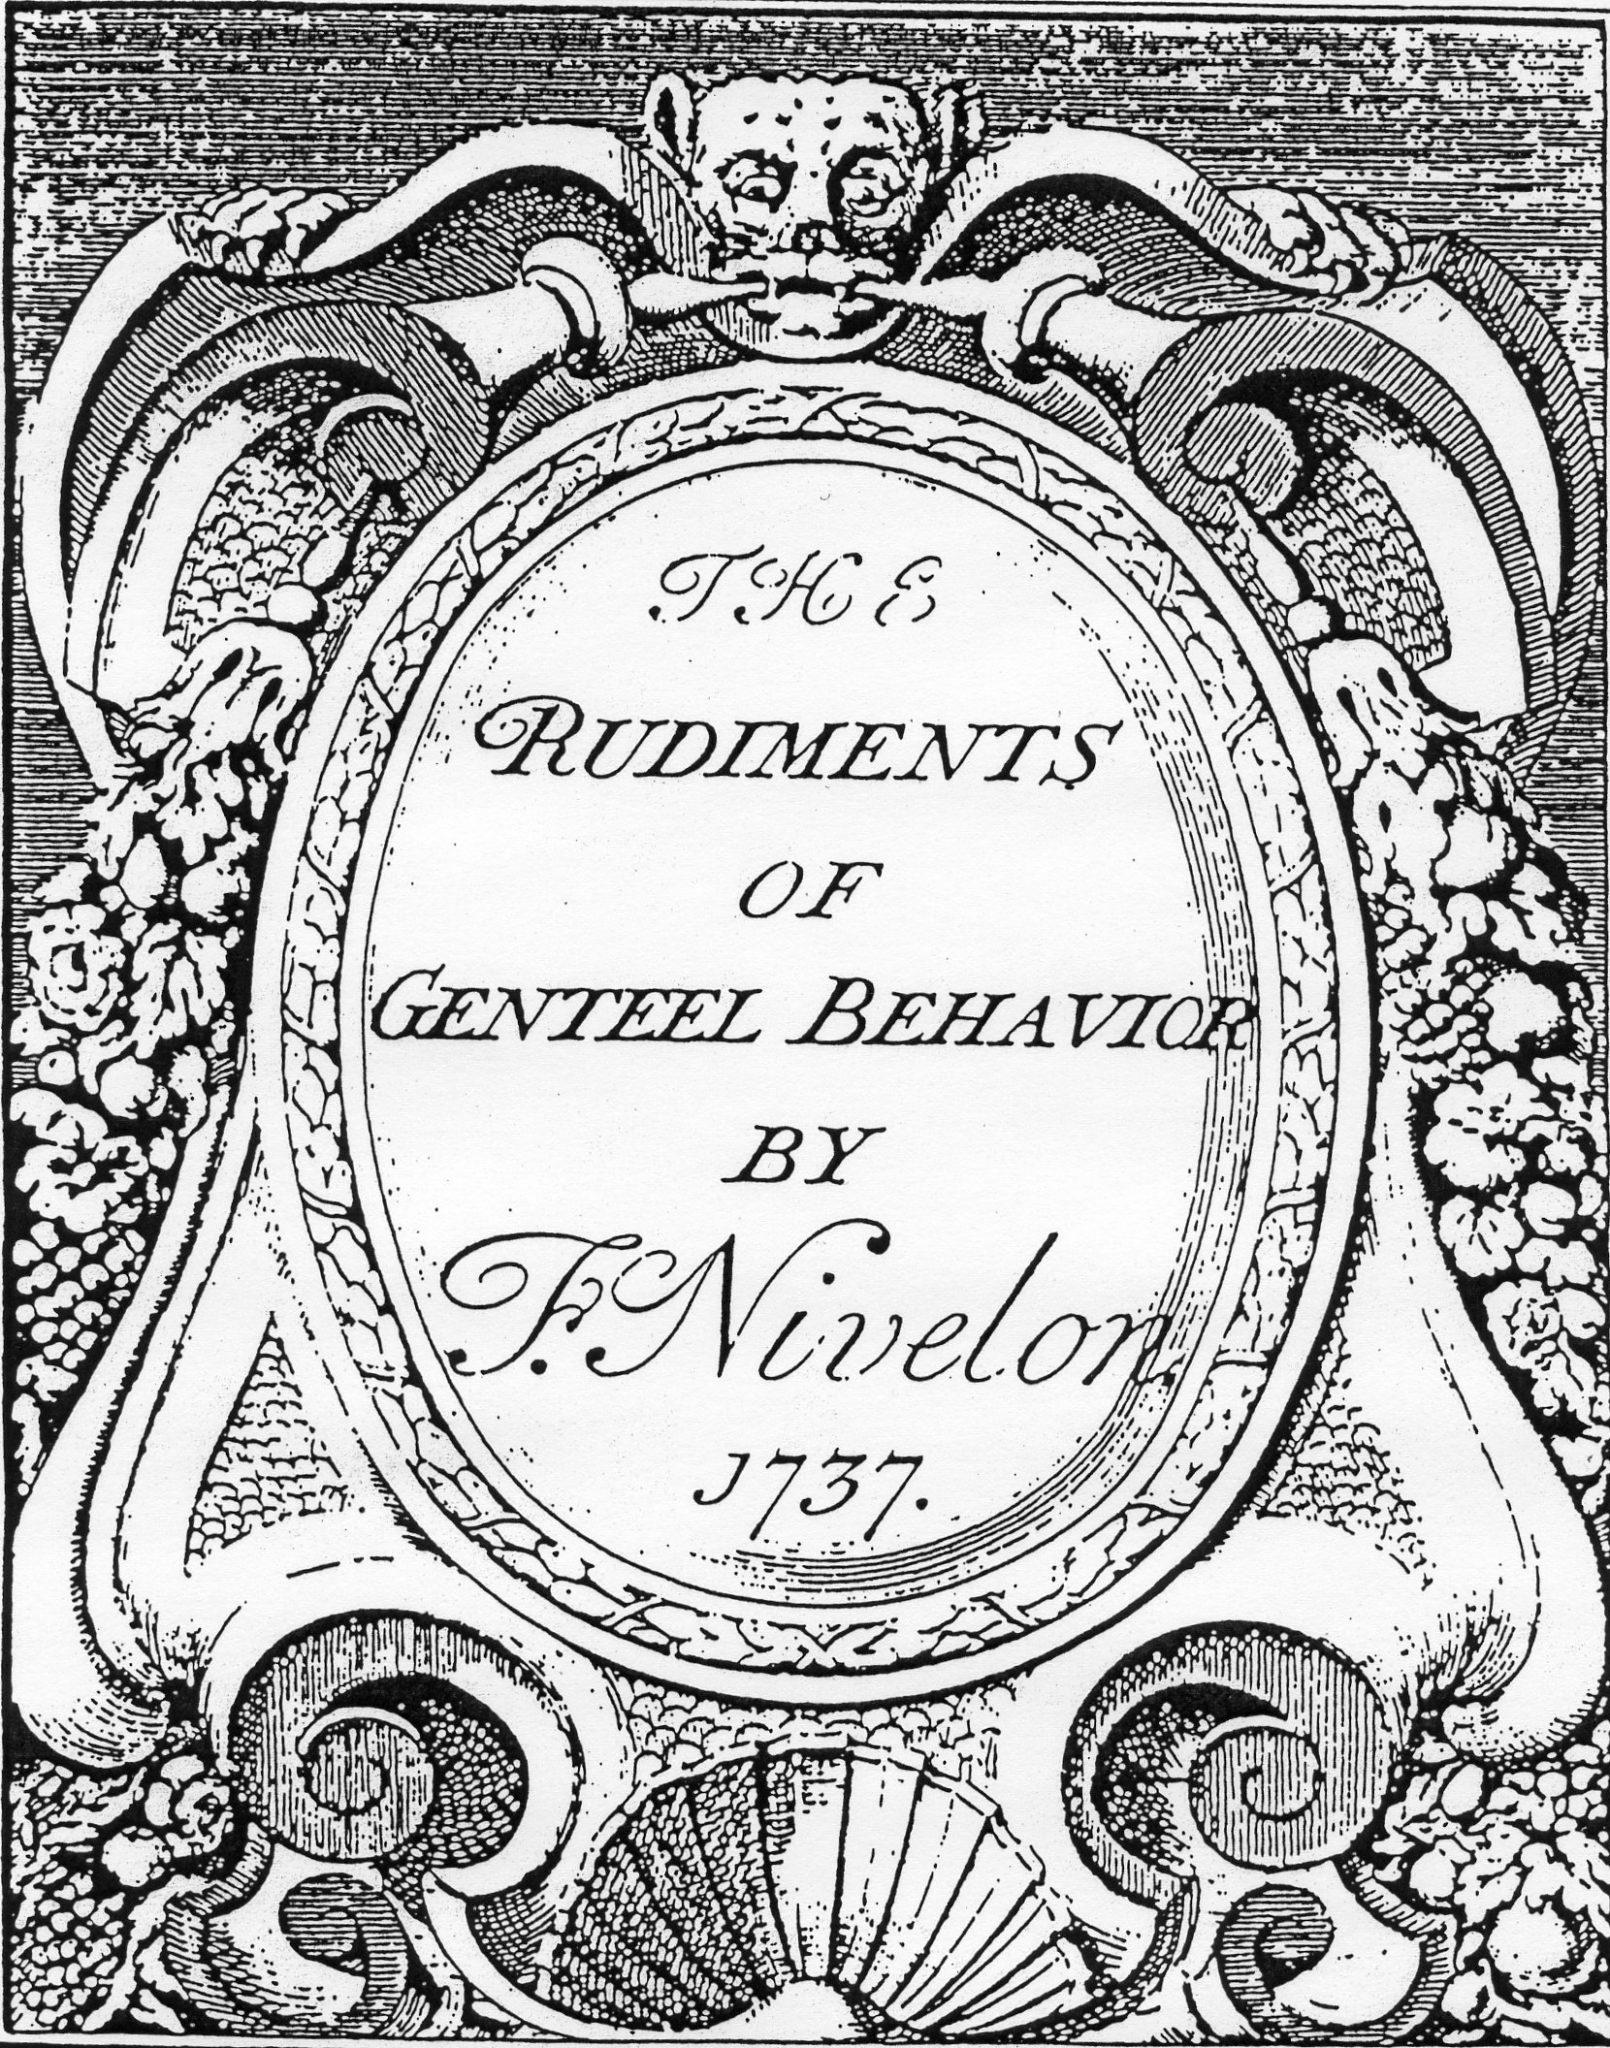 Rudiments of Genteel Behaviour by F. Nivelon, 1737